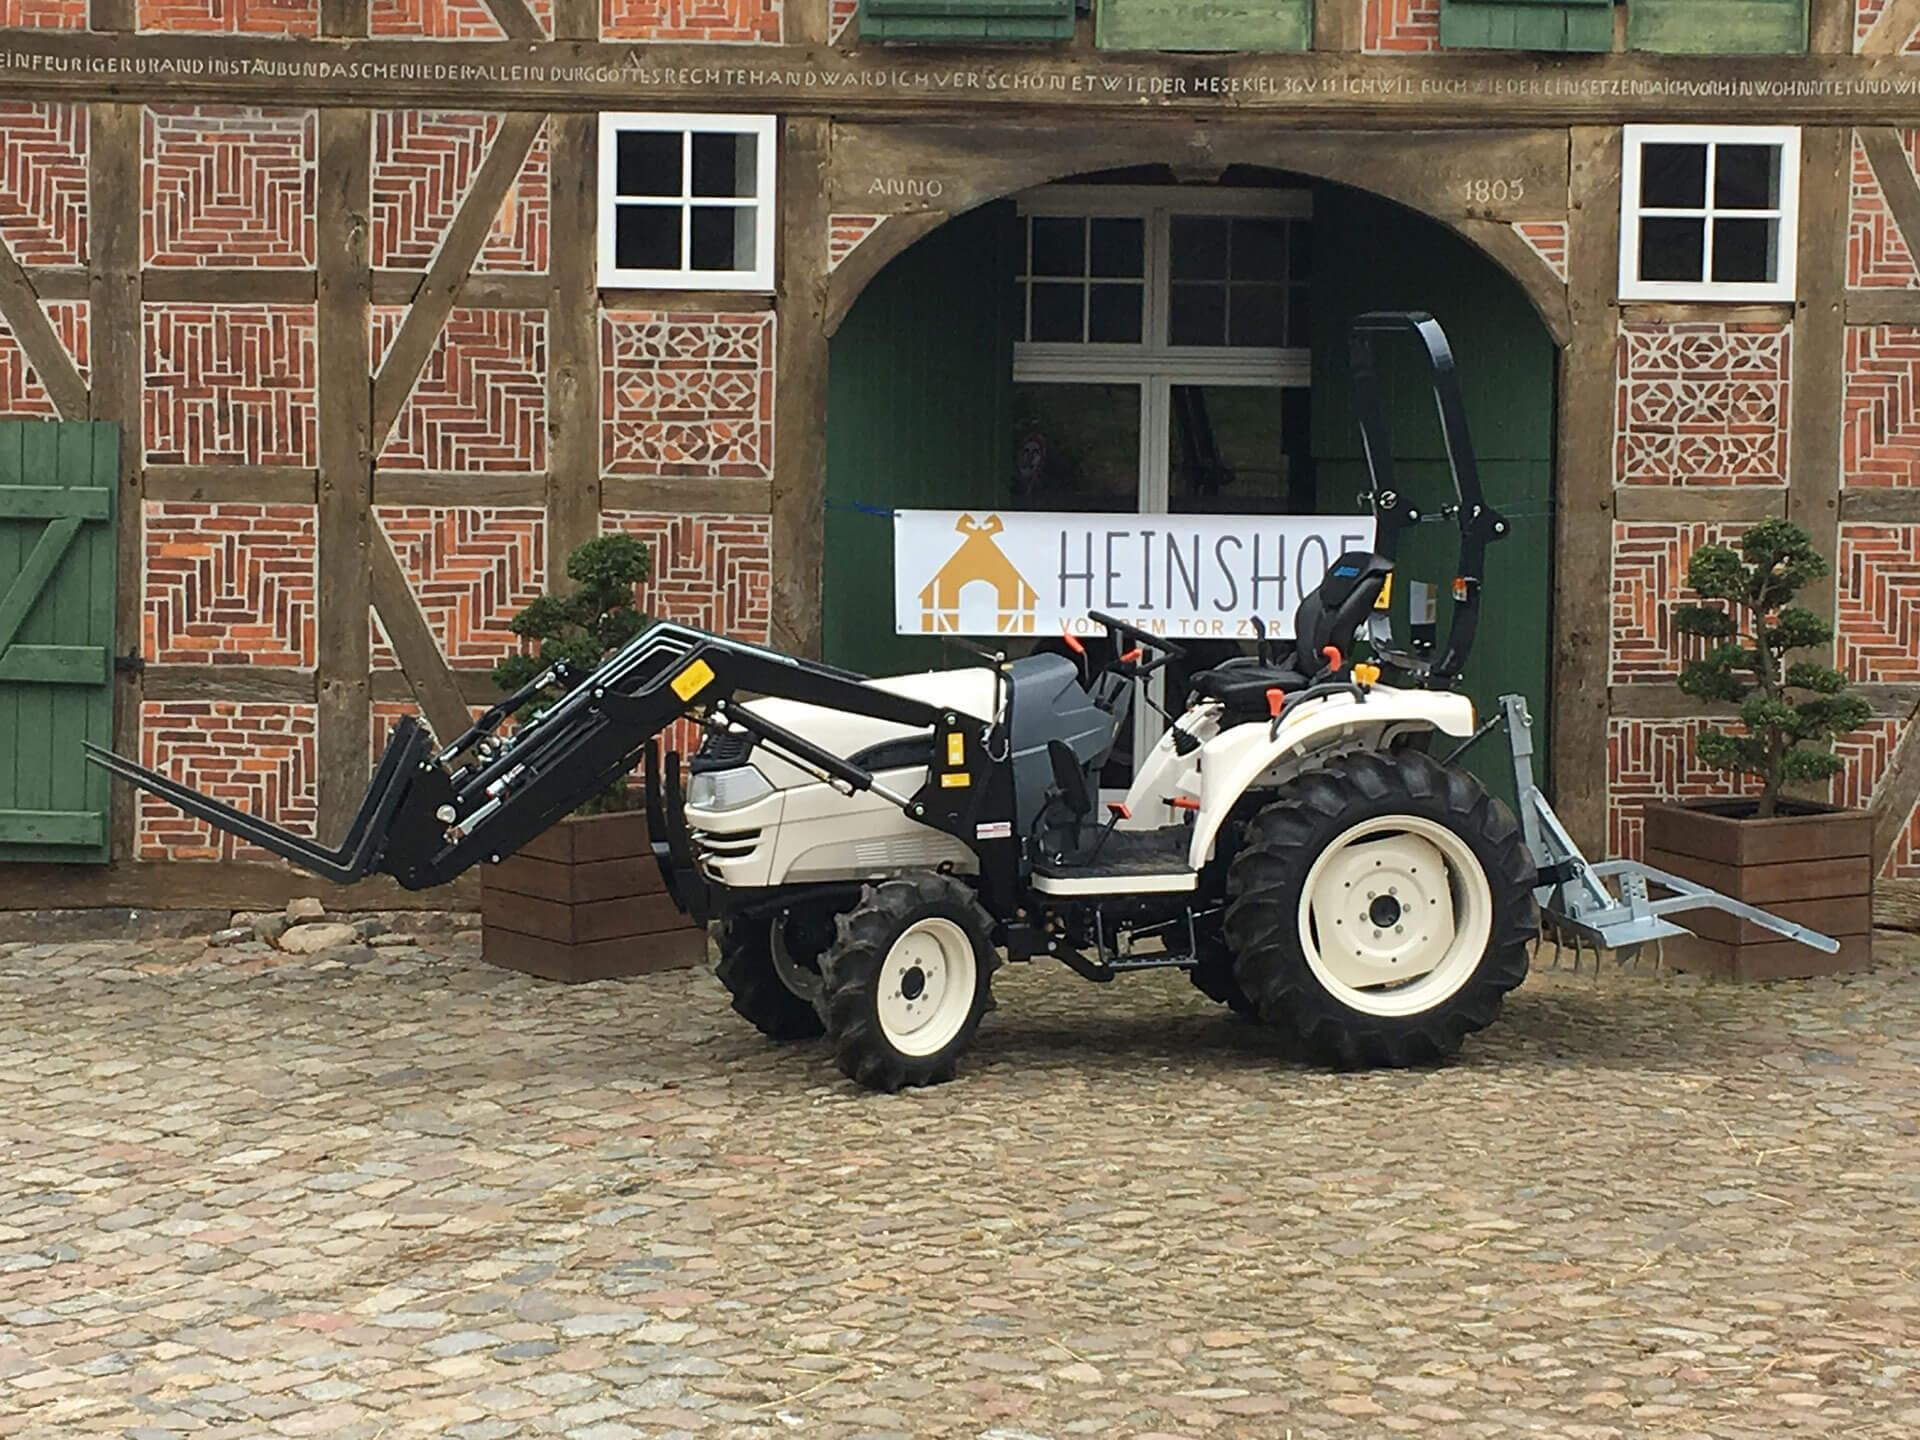 Heinshof-Trecker